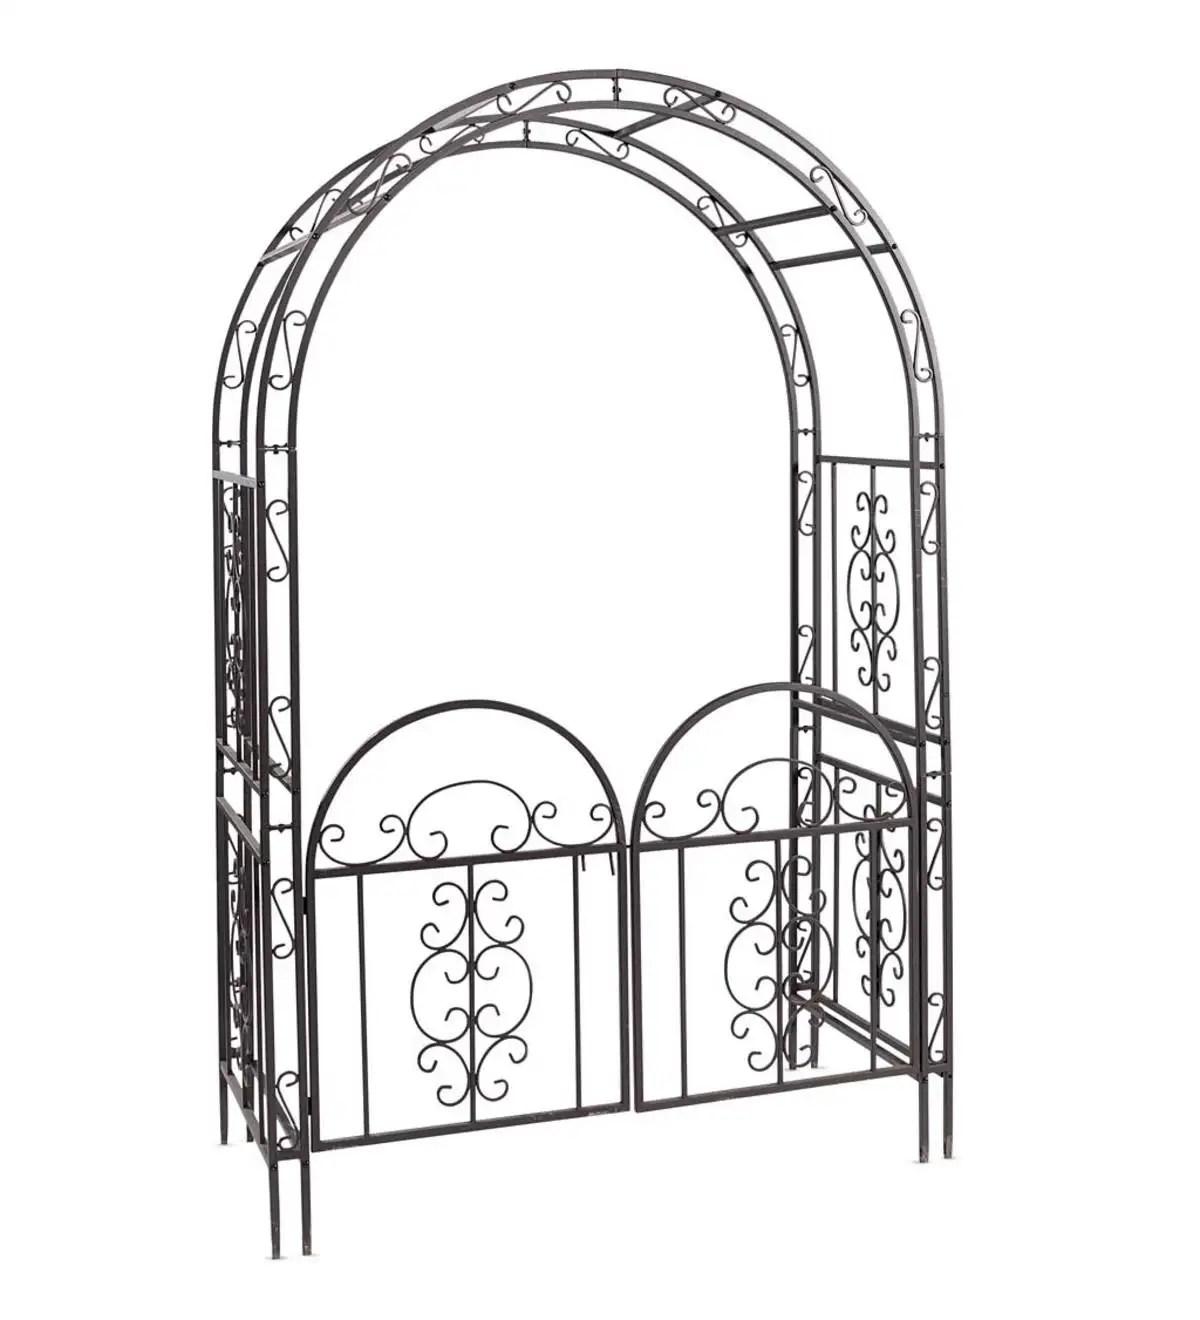 Montebello Scrollwork Metal Garden Arbor with Gate